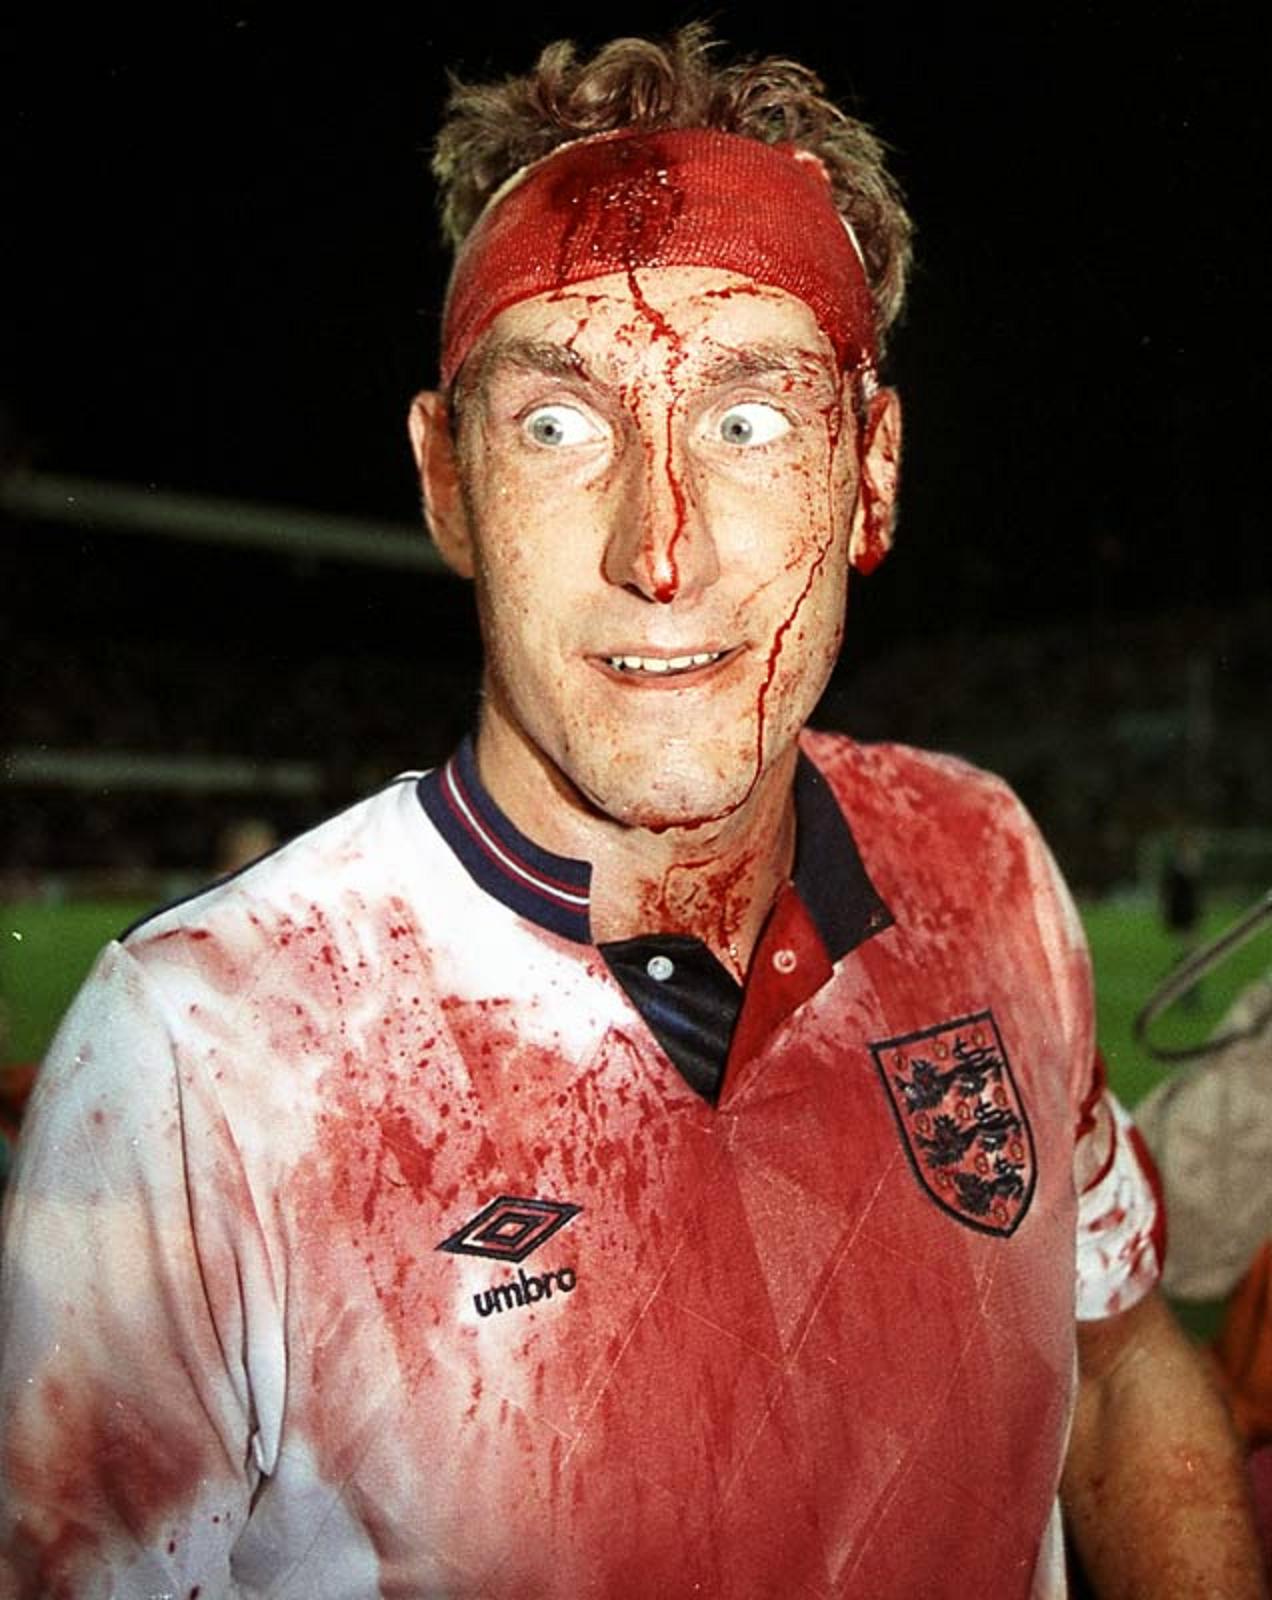 Terry Butcher- World Cup Qualfier Sweden vs England, 6 September 1989, Råsunda Stadium Stockholm